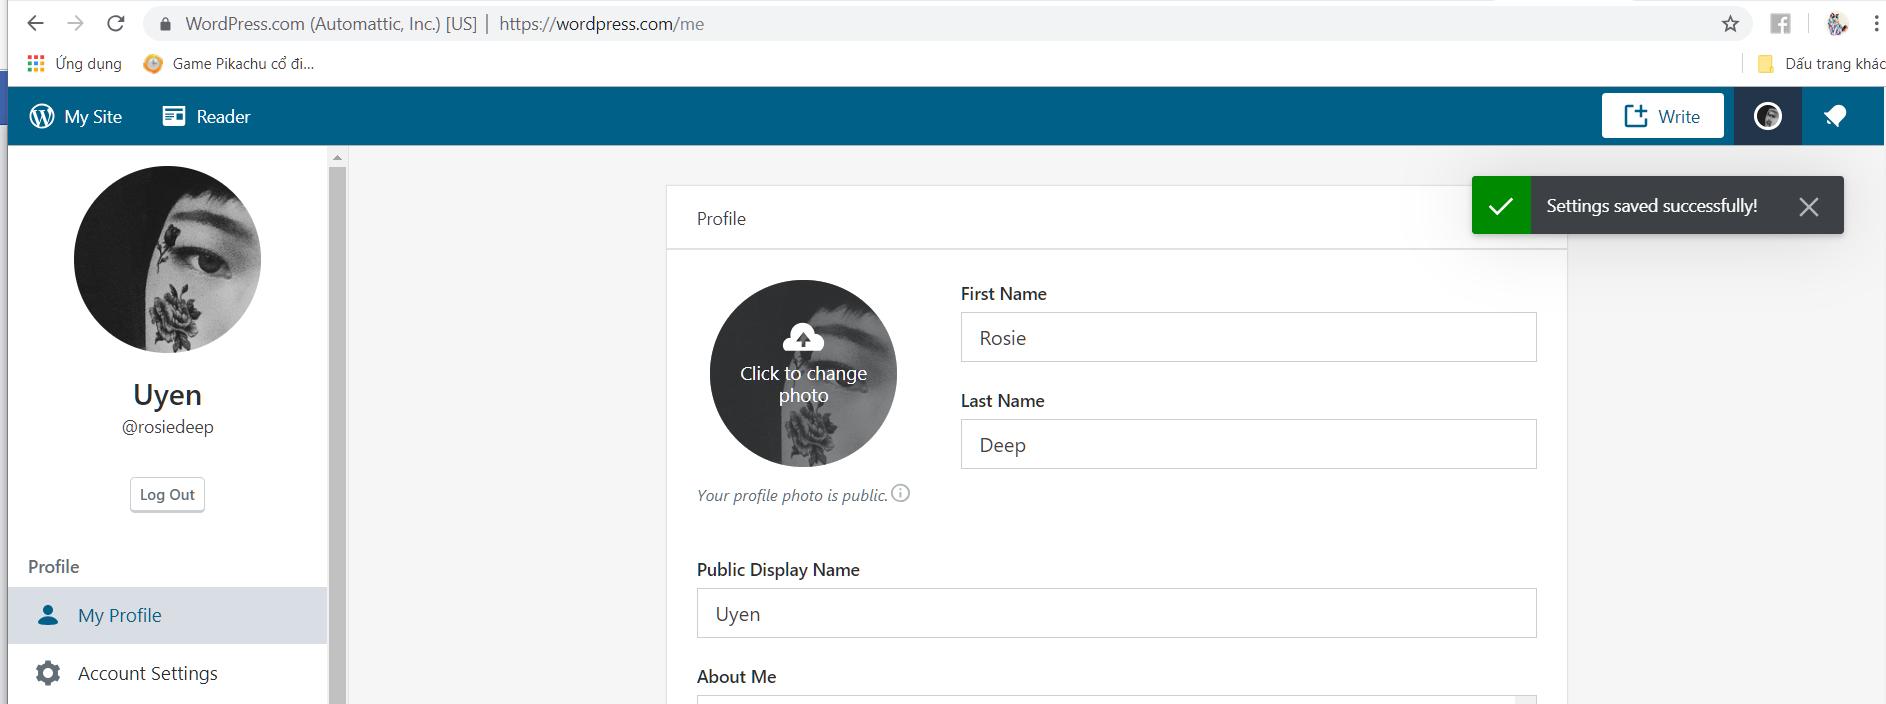 profile page 6